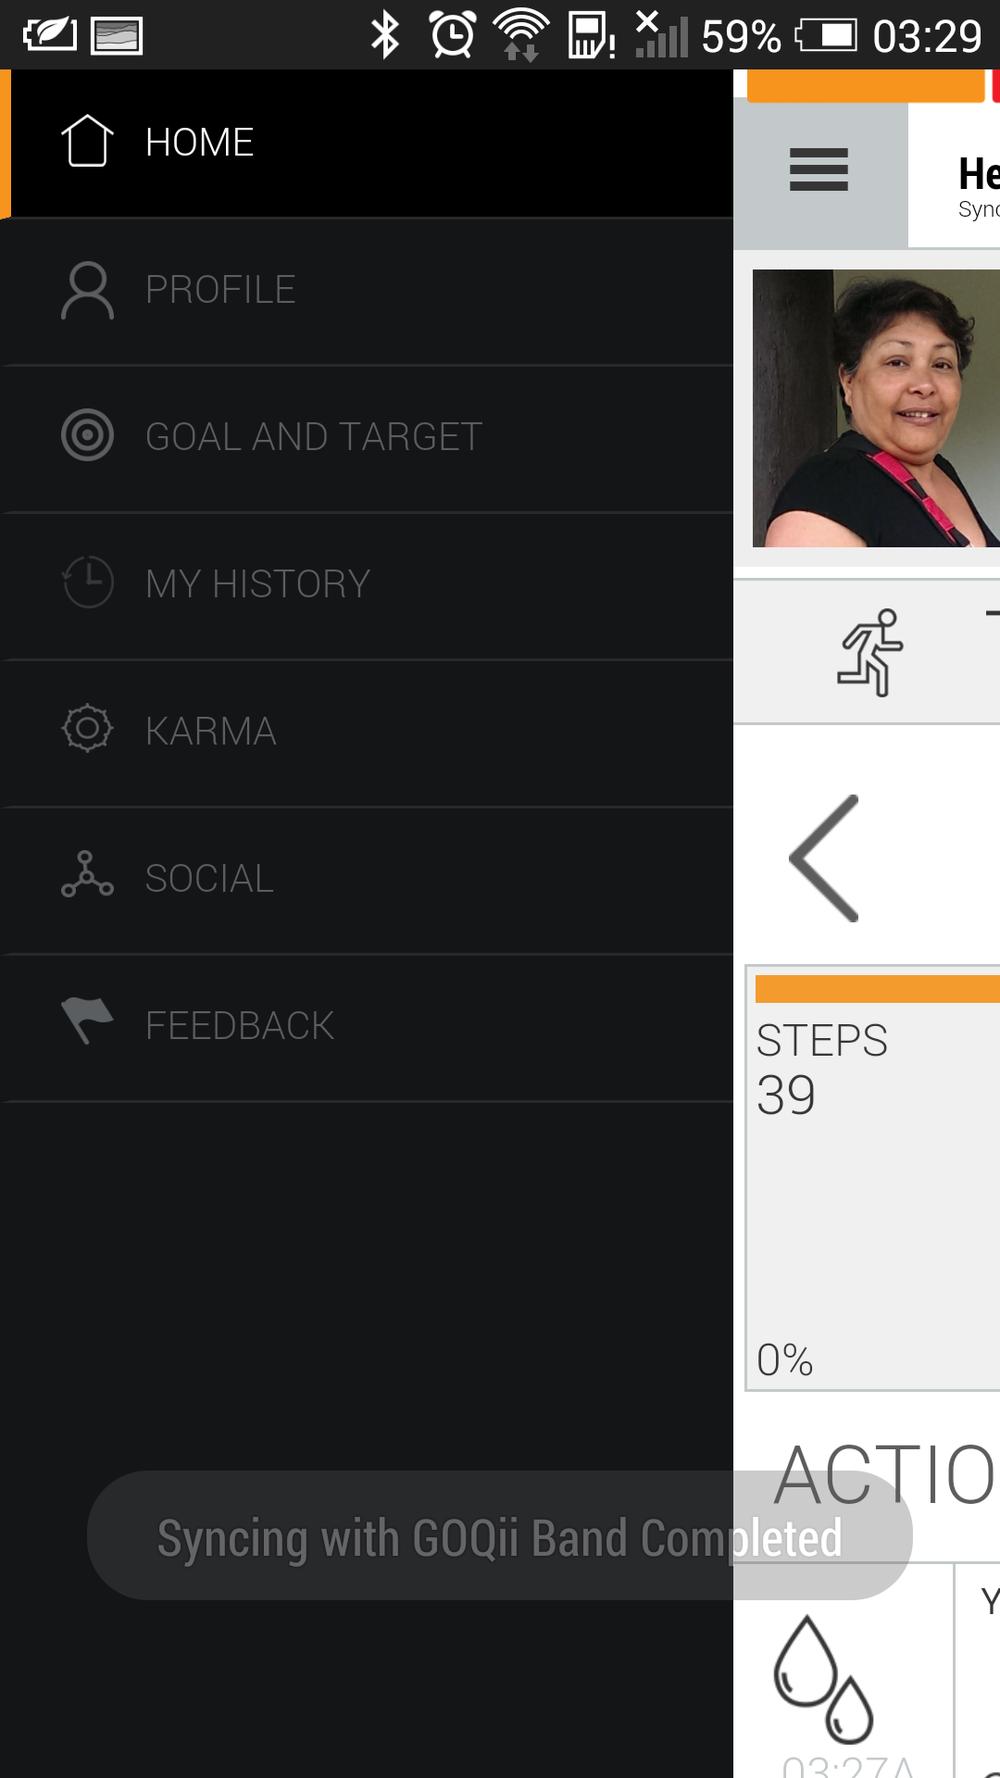 screenshot_2014-10-30-03-29-51.png